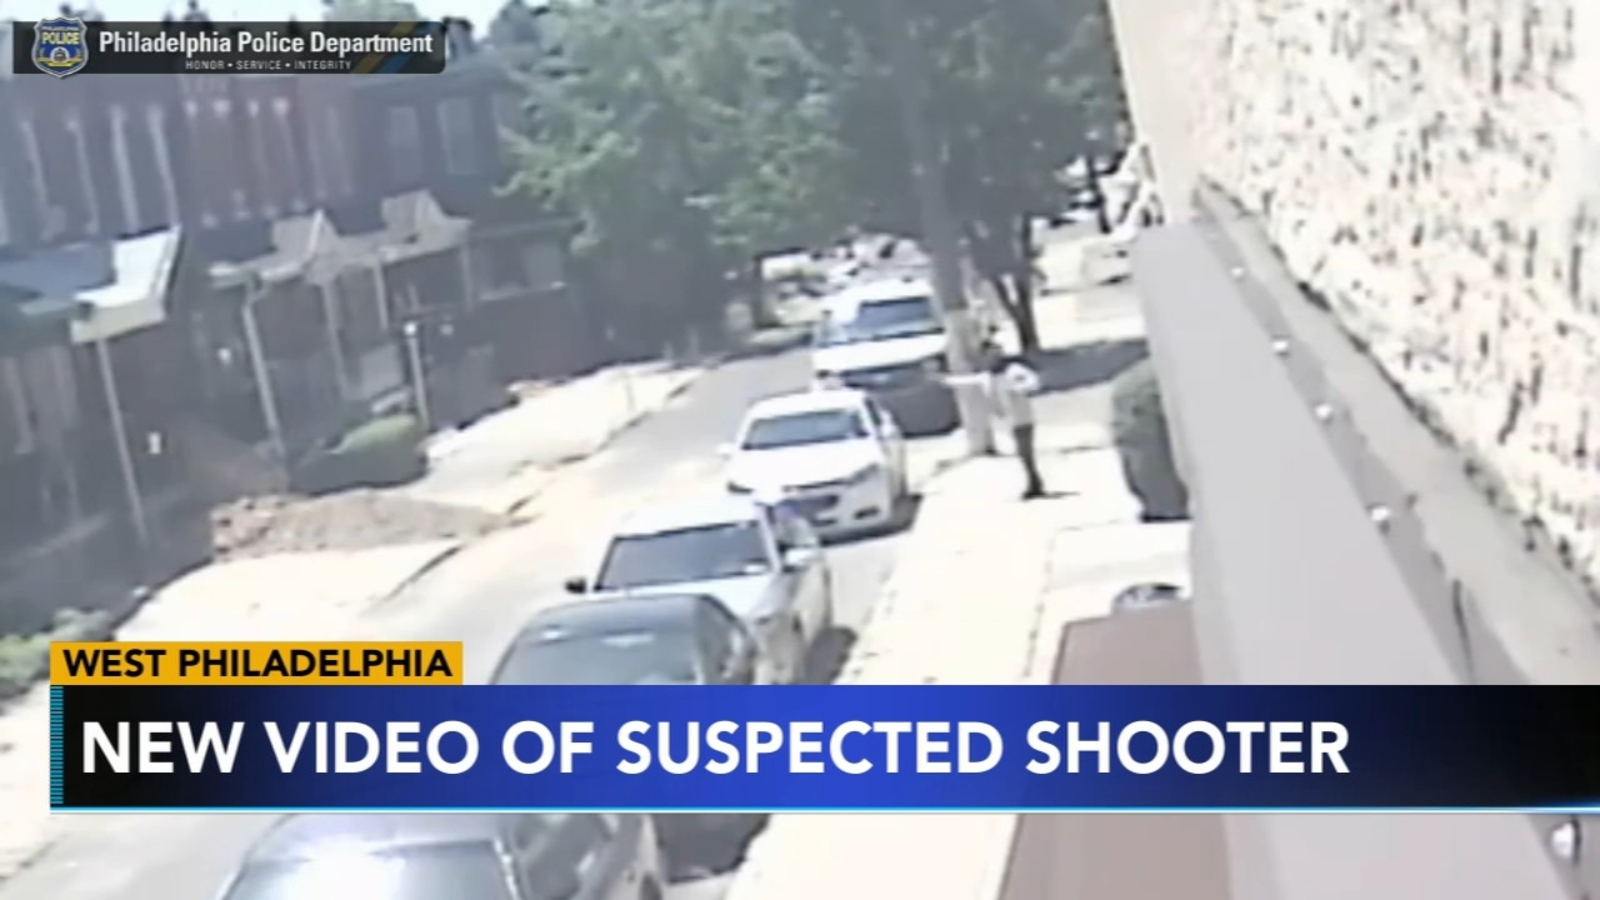 New video shows triple shooting in West Philadelphia